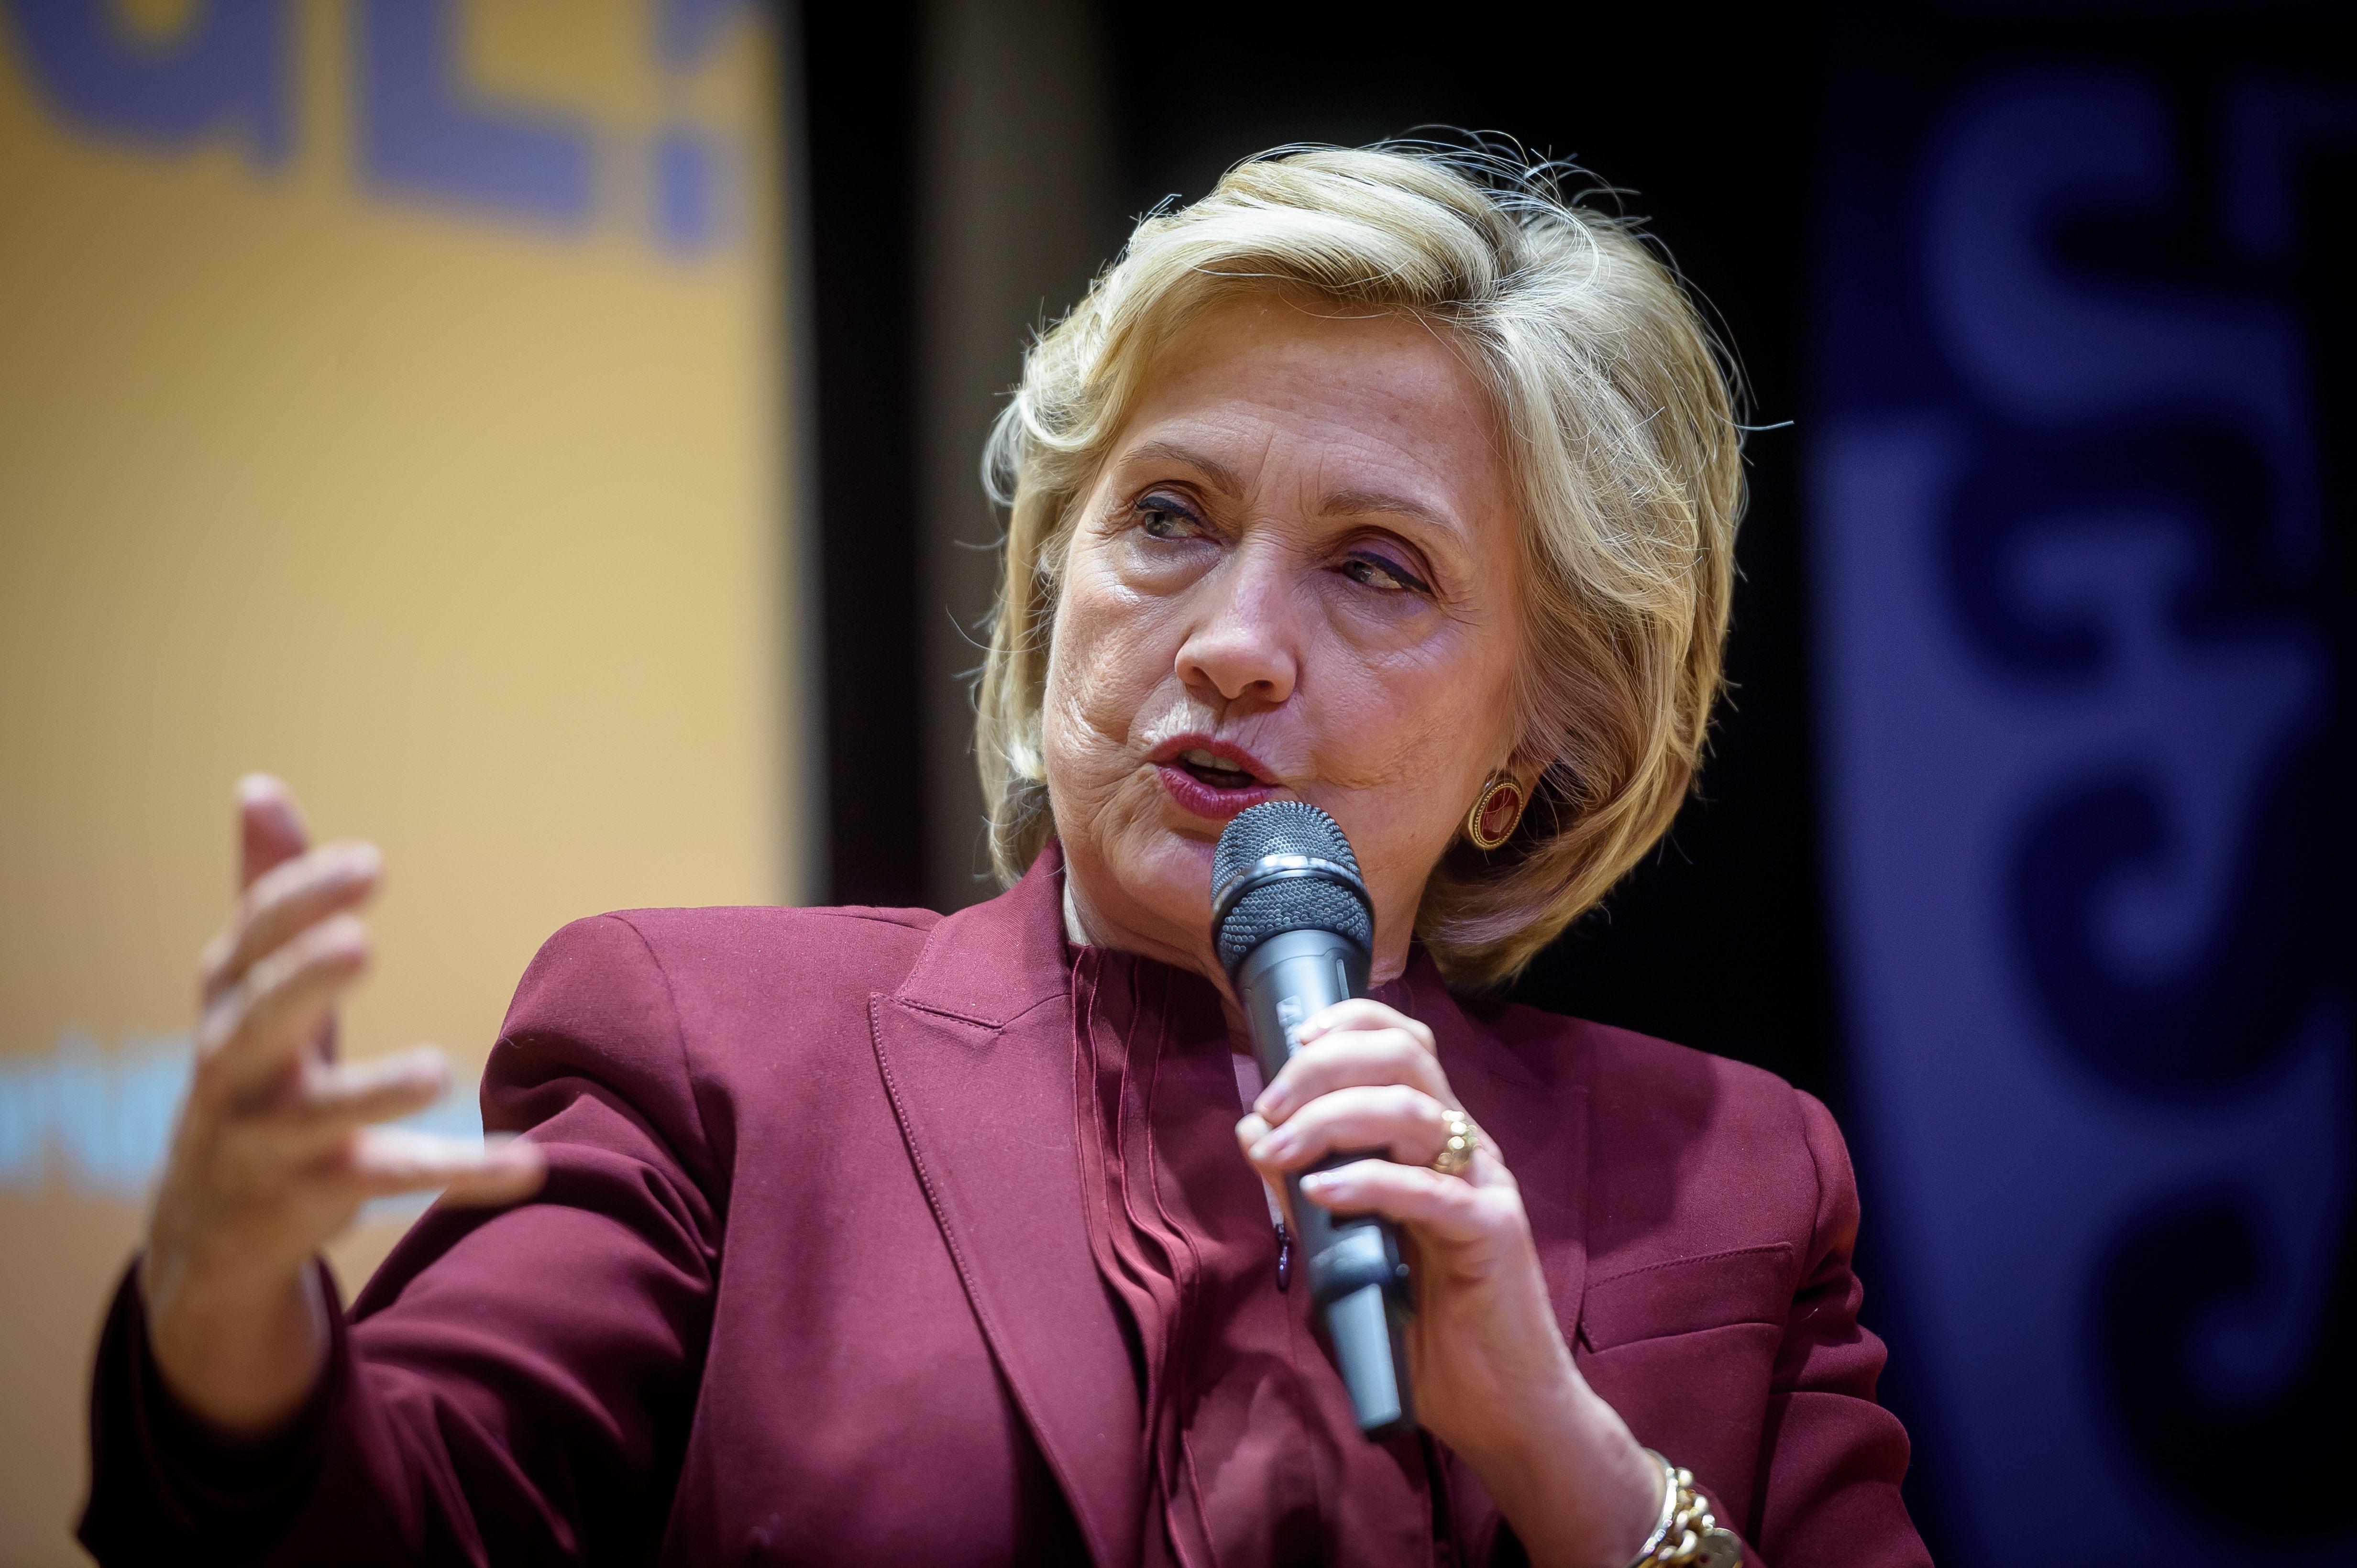 Sorry, Hillary: Democrats dont need a savior